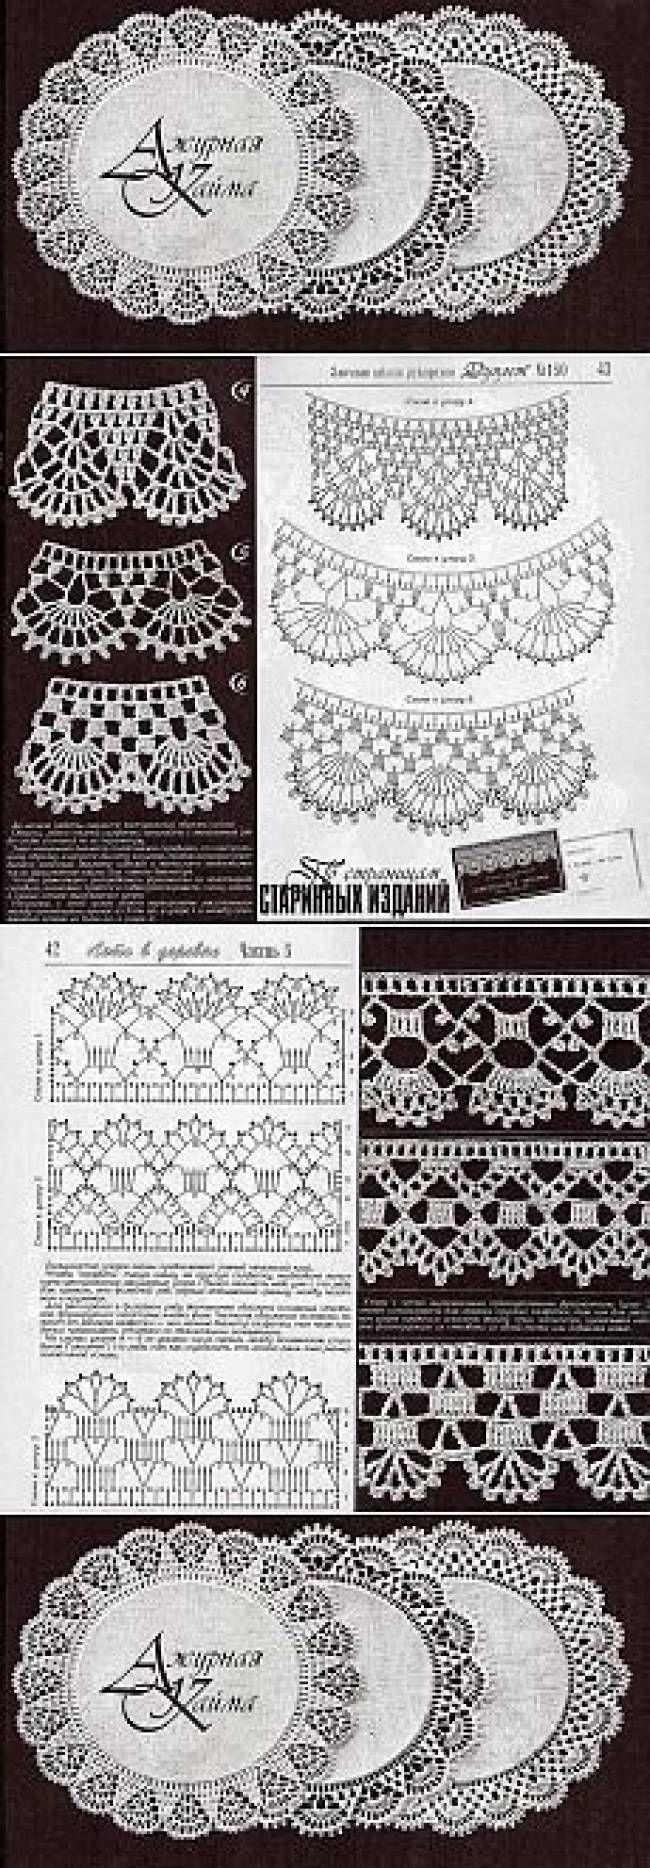 Crochet Back Scrubbie – Baby Dress Models 1 Age – Bebek Elbise Modelleri 1 Yaş